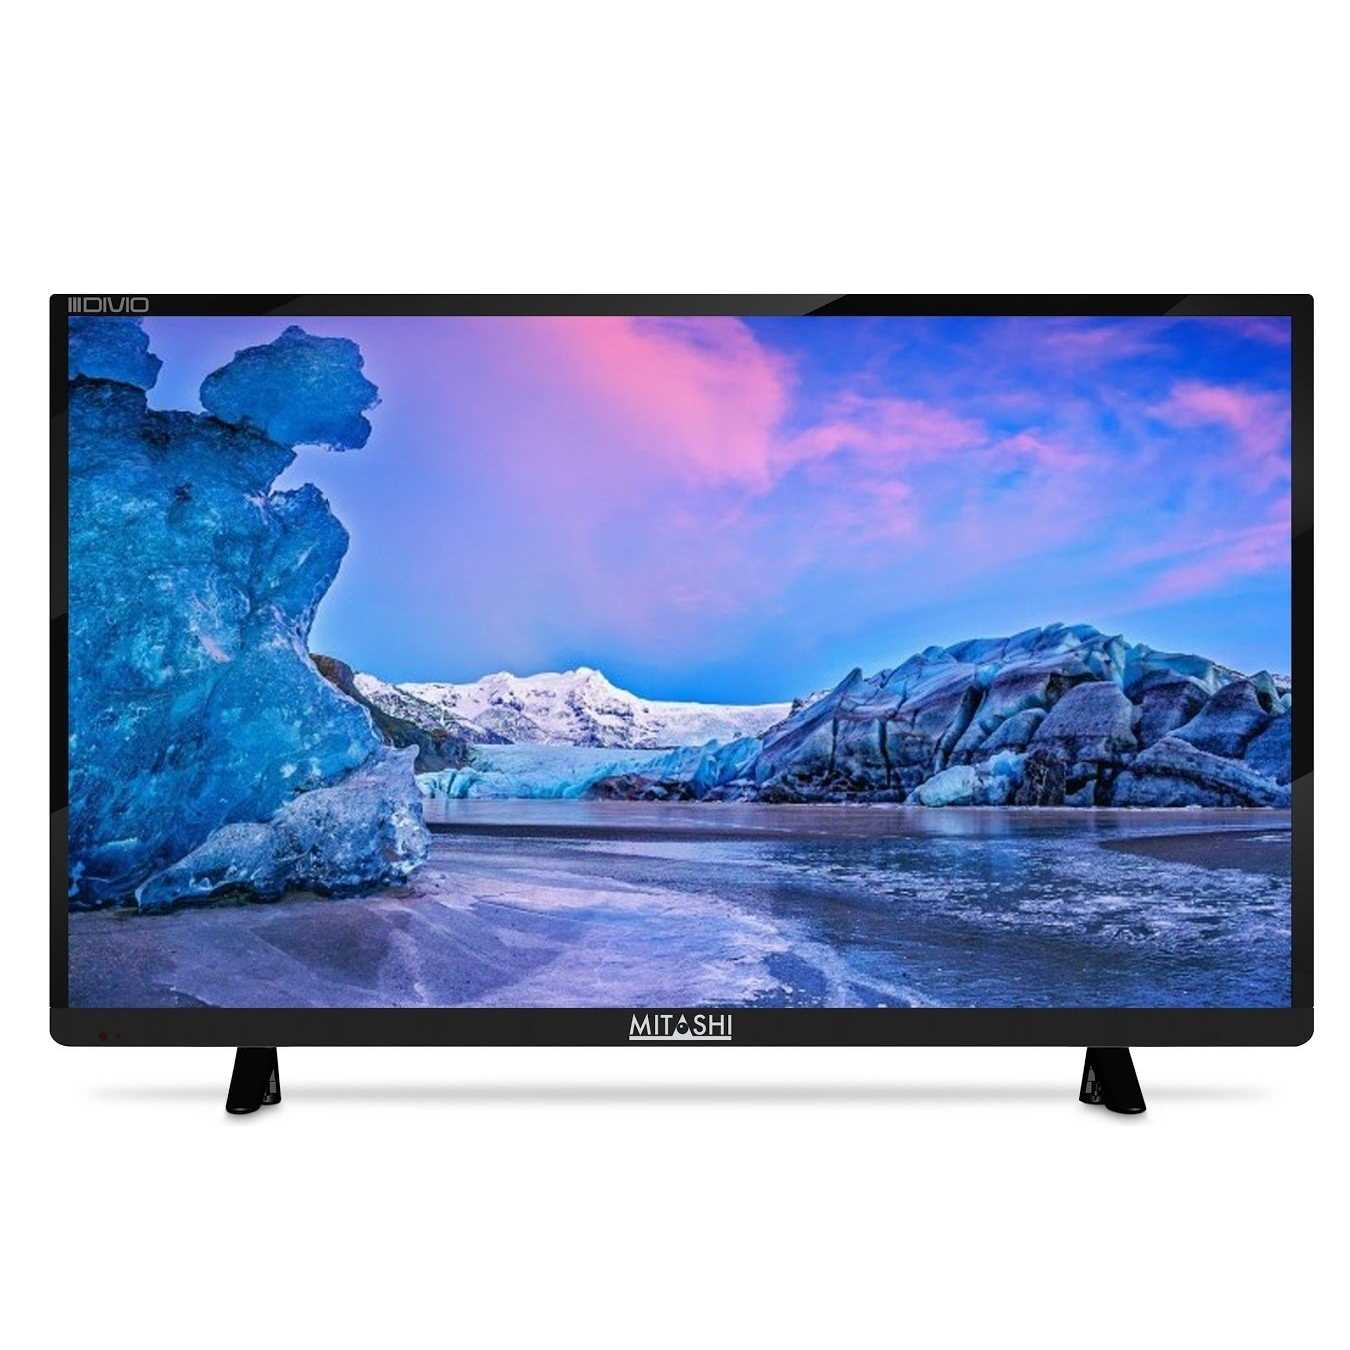 Mitashi MiDE032v25 31.5 Inch HD Ready LED Television